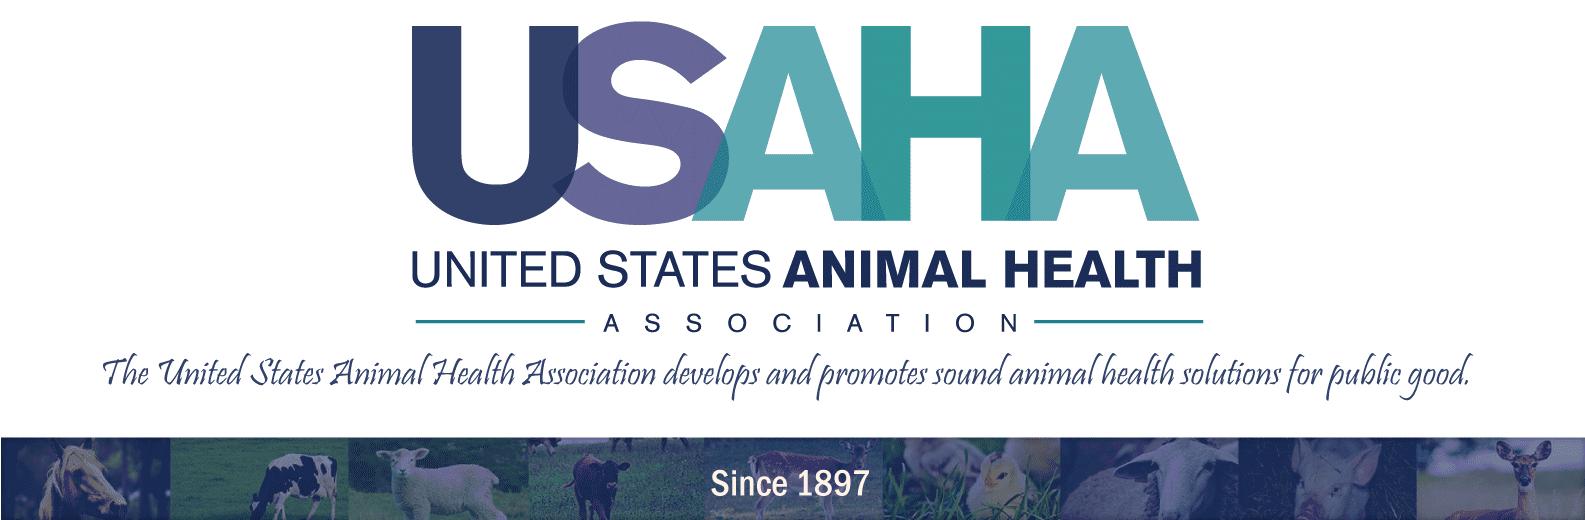 USAHA Mission